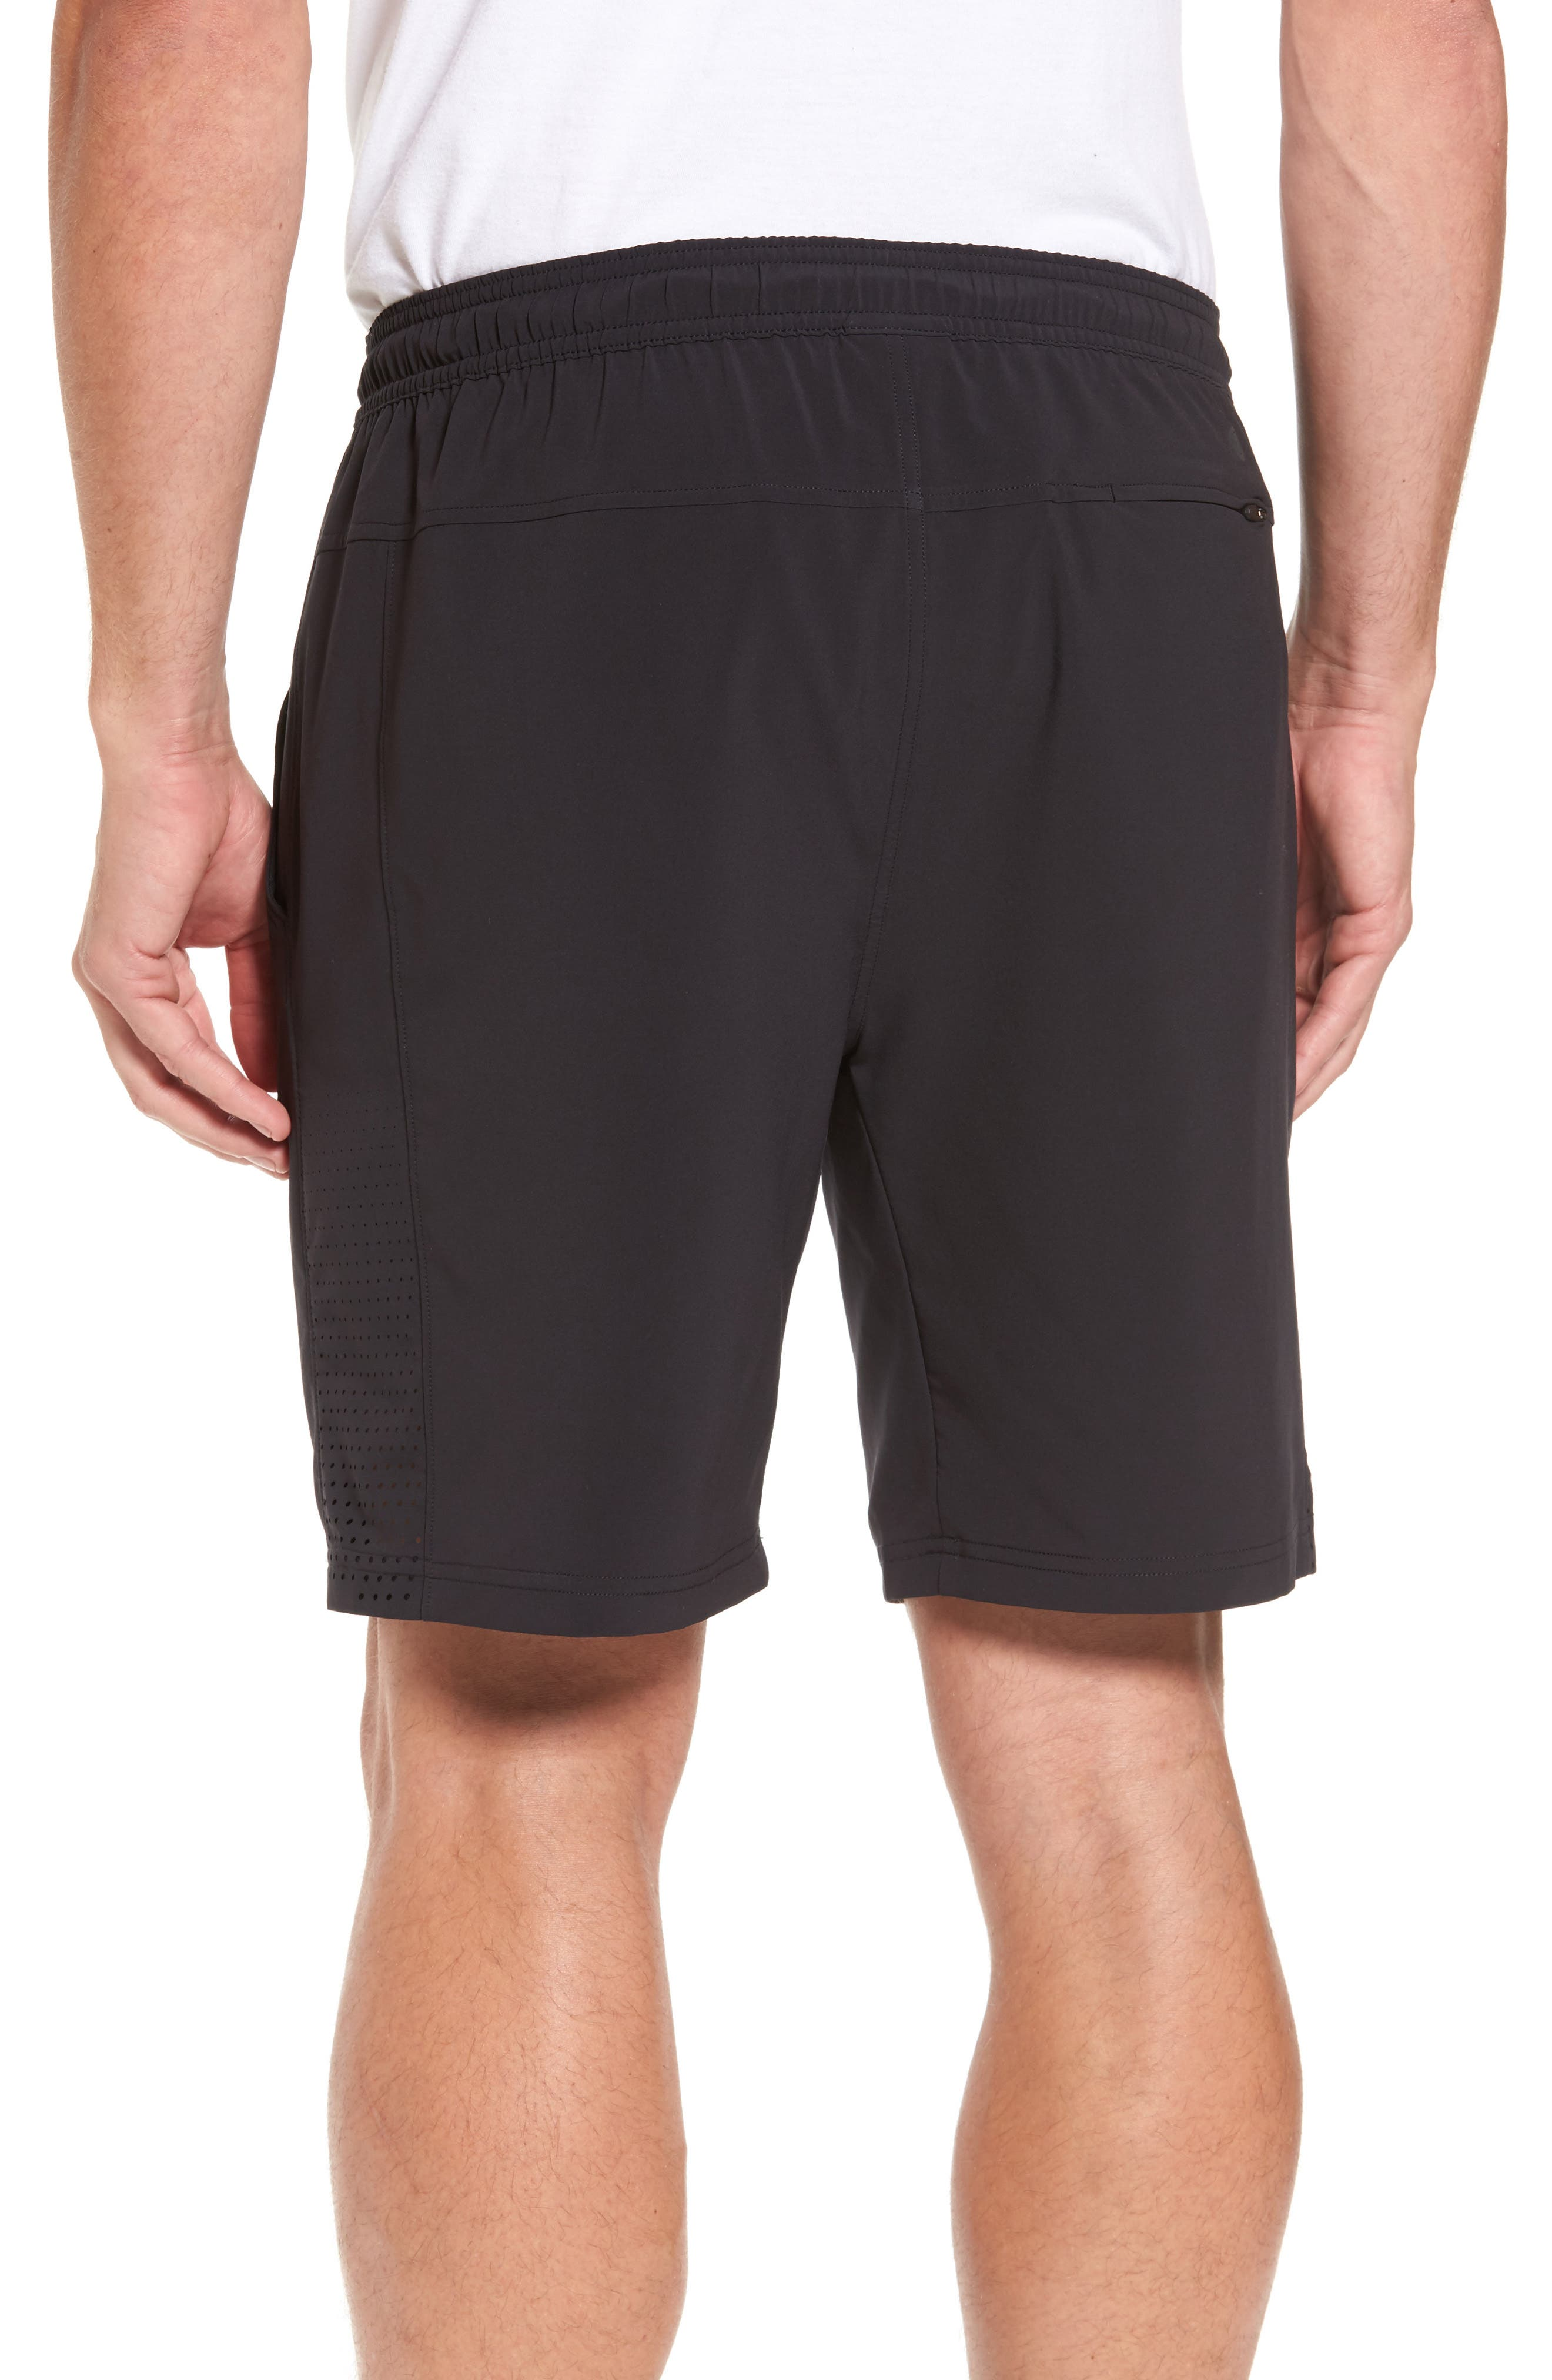 Alternate Image 2  - Zella Graphite Core Athletic Shorts